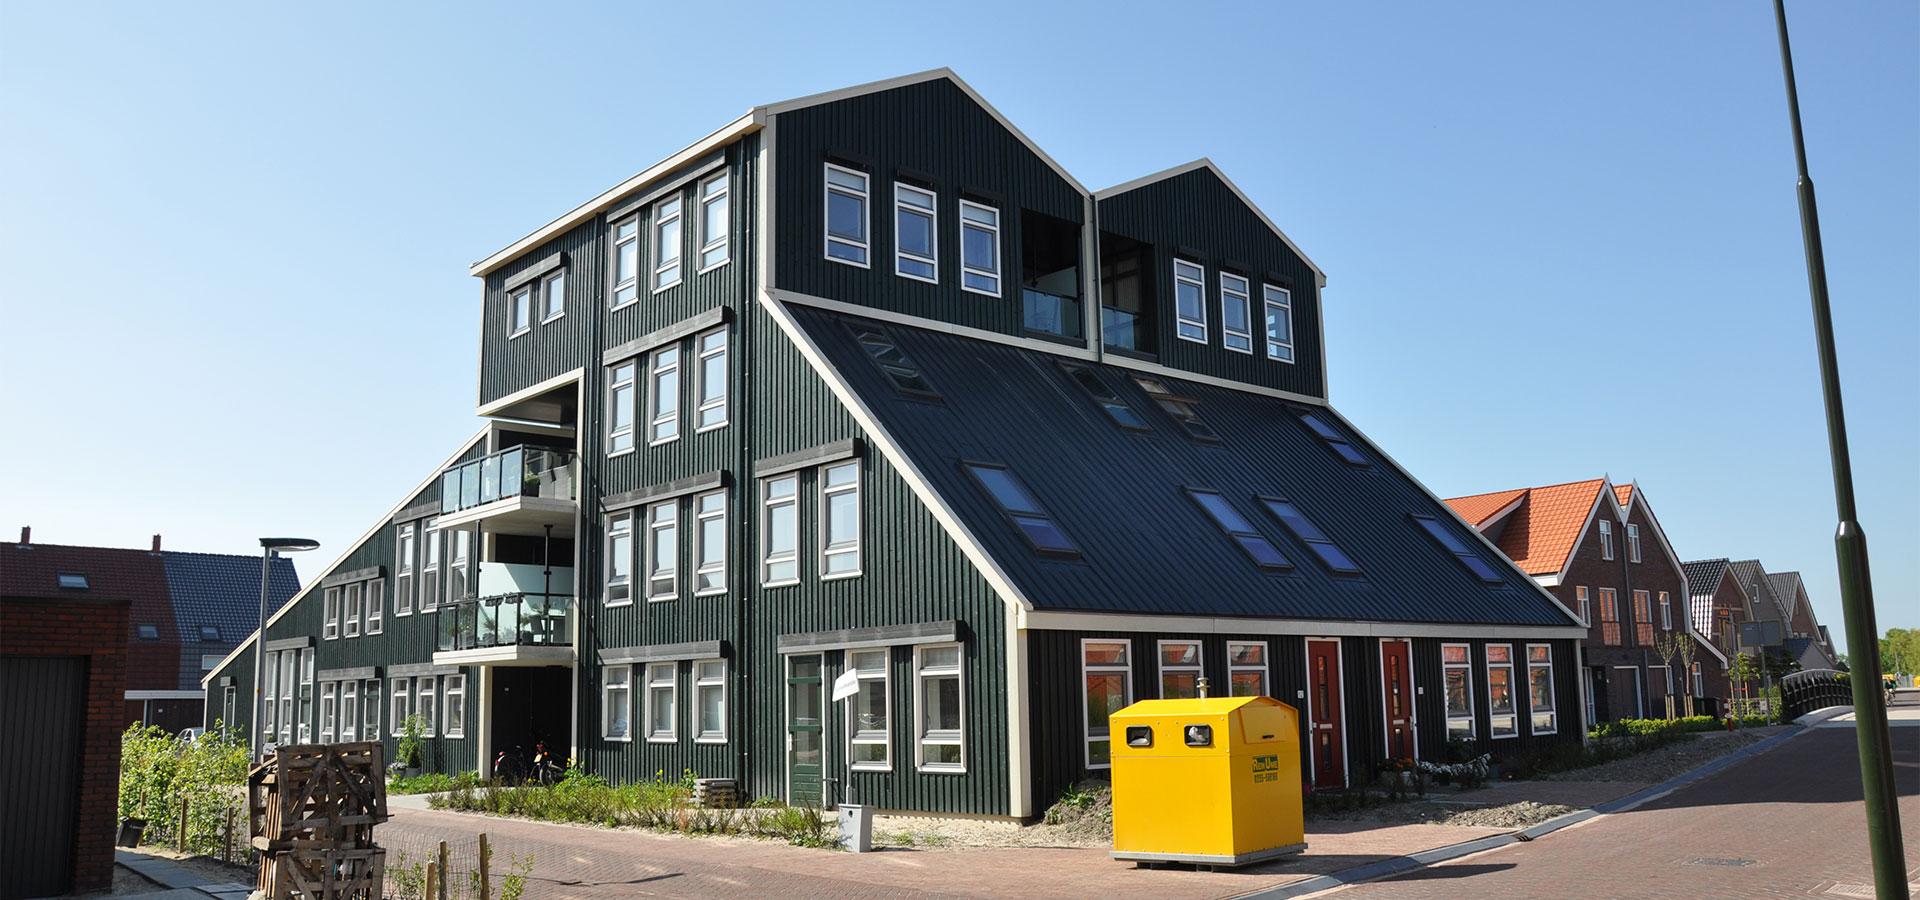 FARO architecten Twuyverhoek Sint Pancras 09